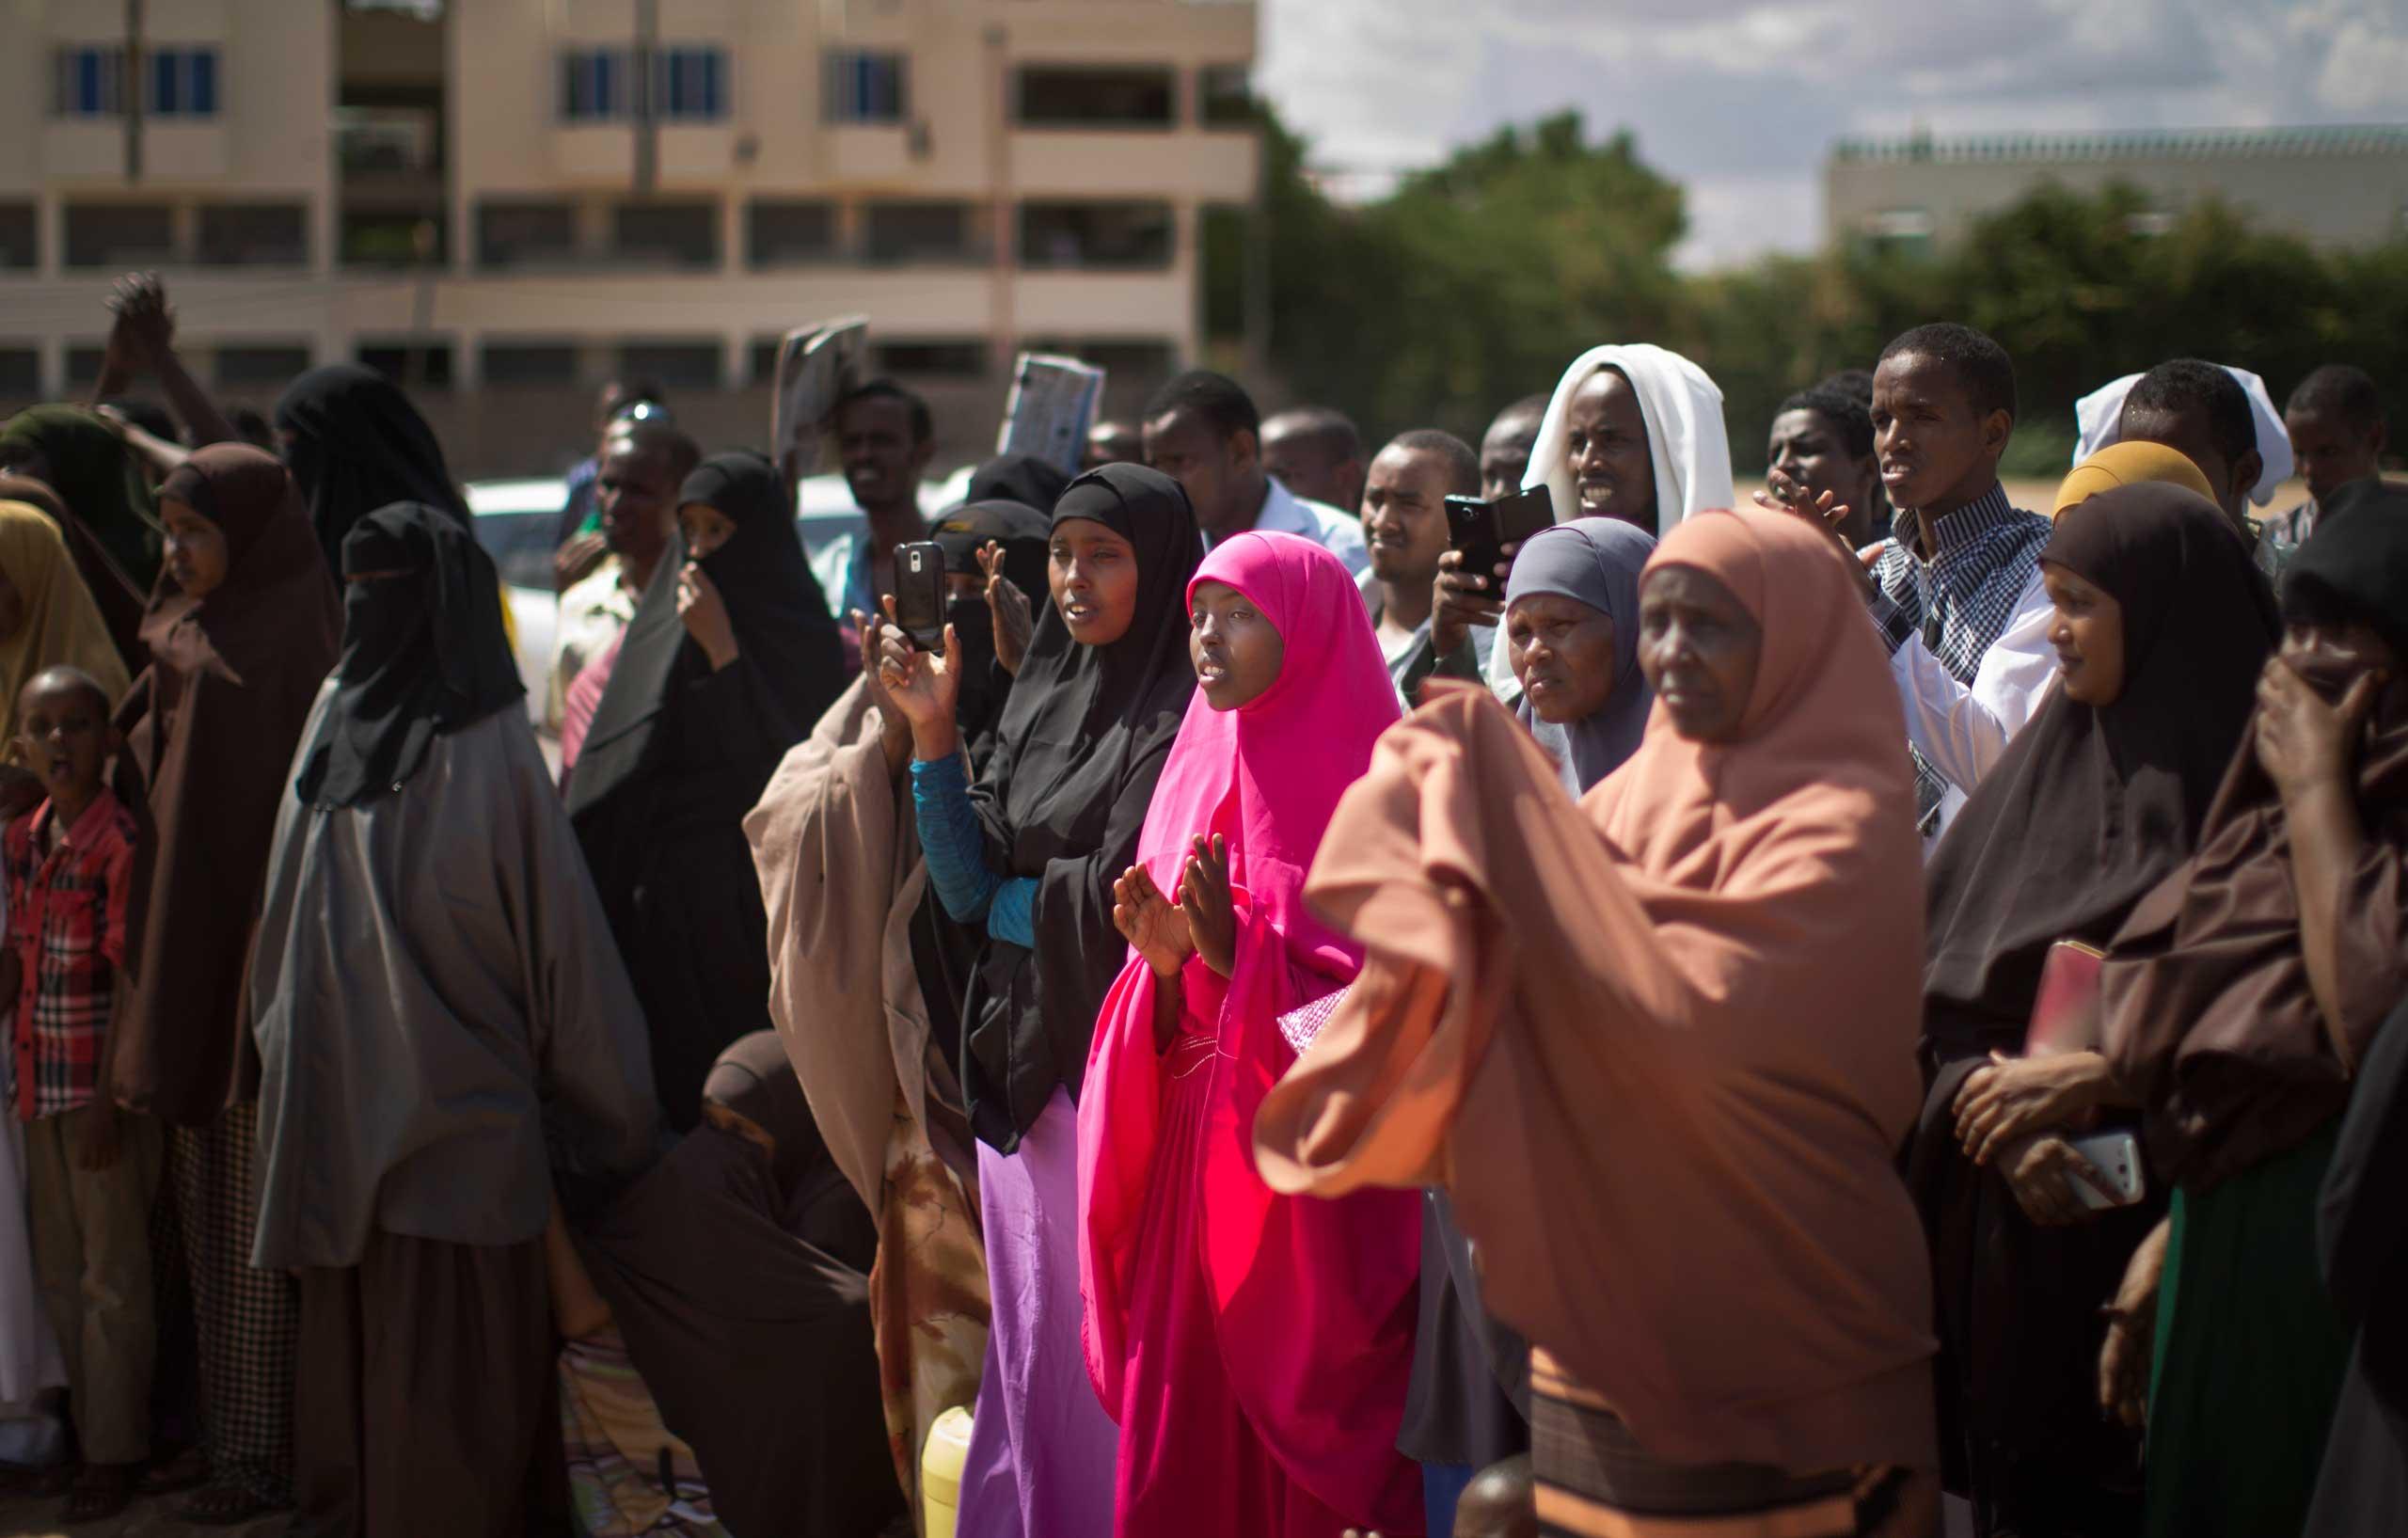 Kenyan Muslim women and men applaud as a women's representative denounces the latest attack by al-Shabab gunmen, at a public meeting in Garissa, Kenya, on Apr. 3, 2015.